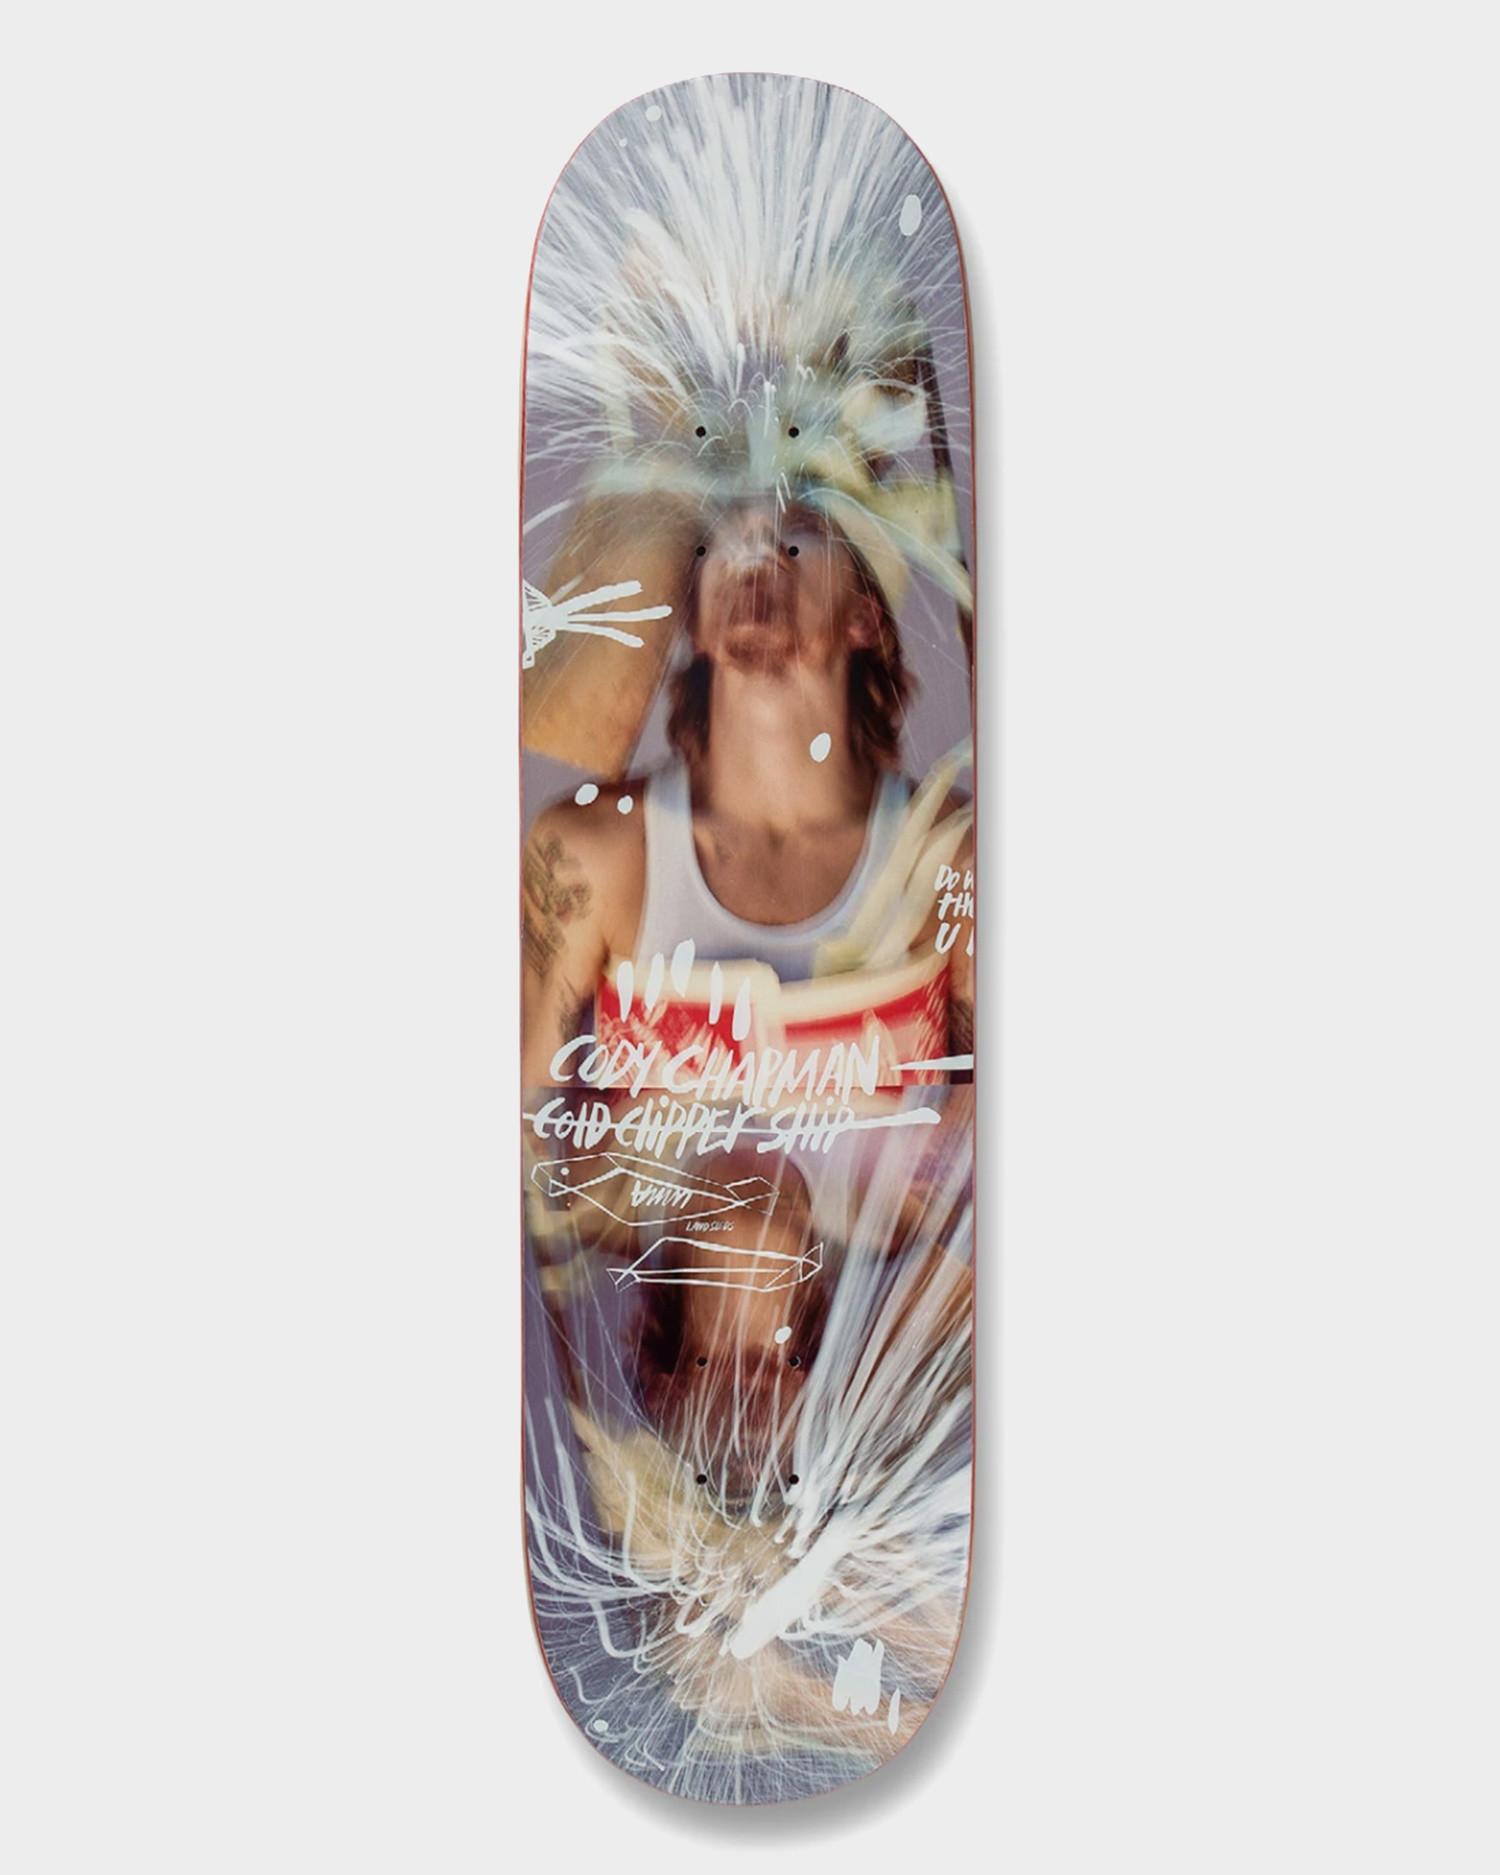 Uma deck Taped Cody 8.125